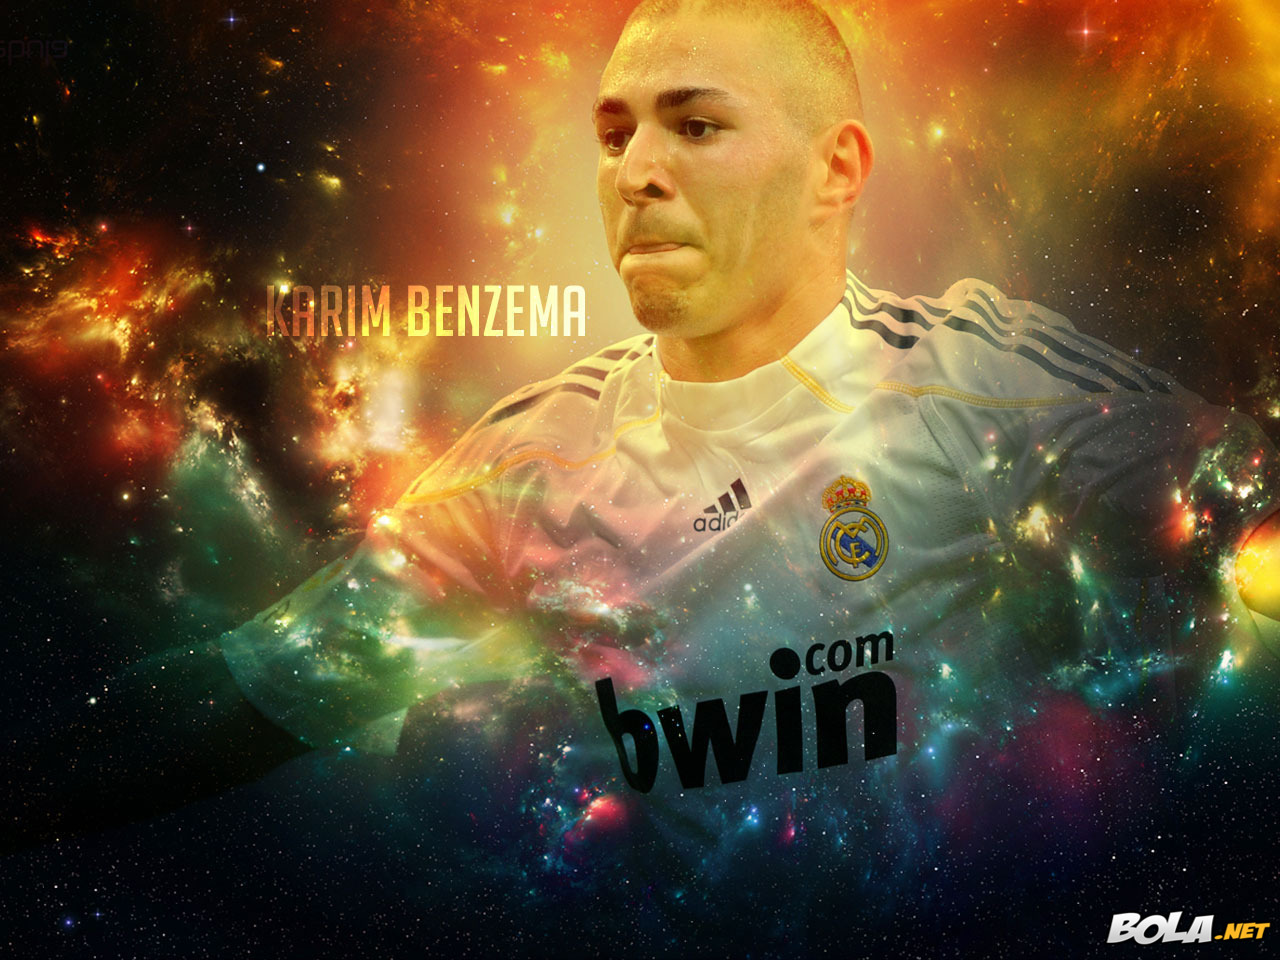 beautiful karim benzema image